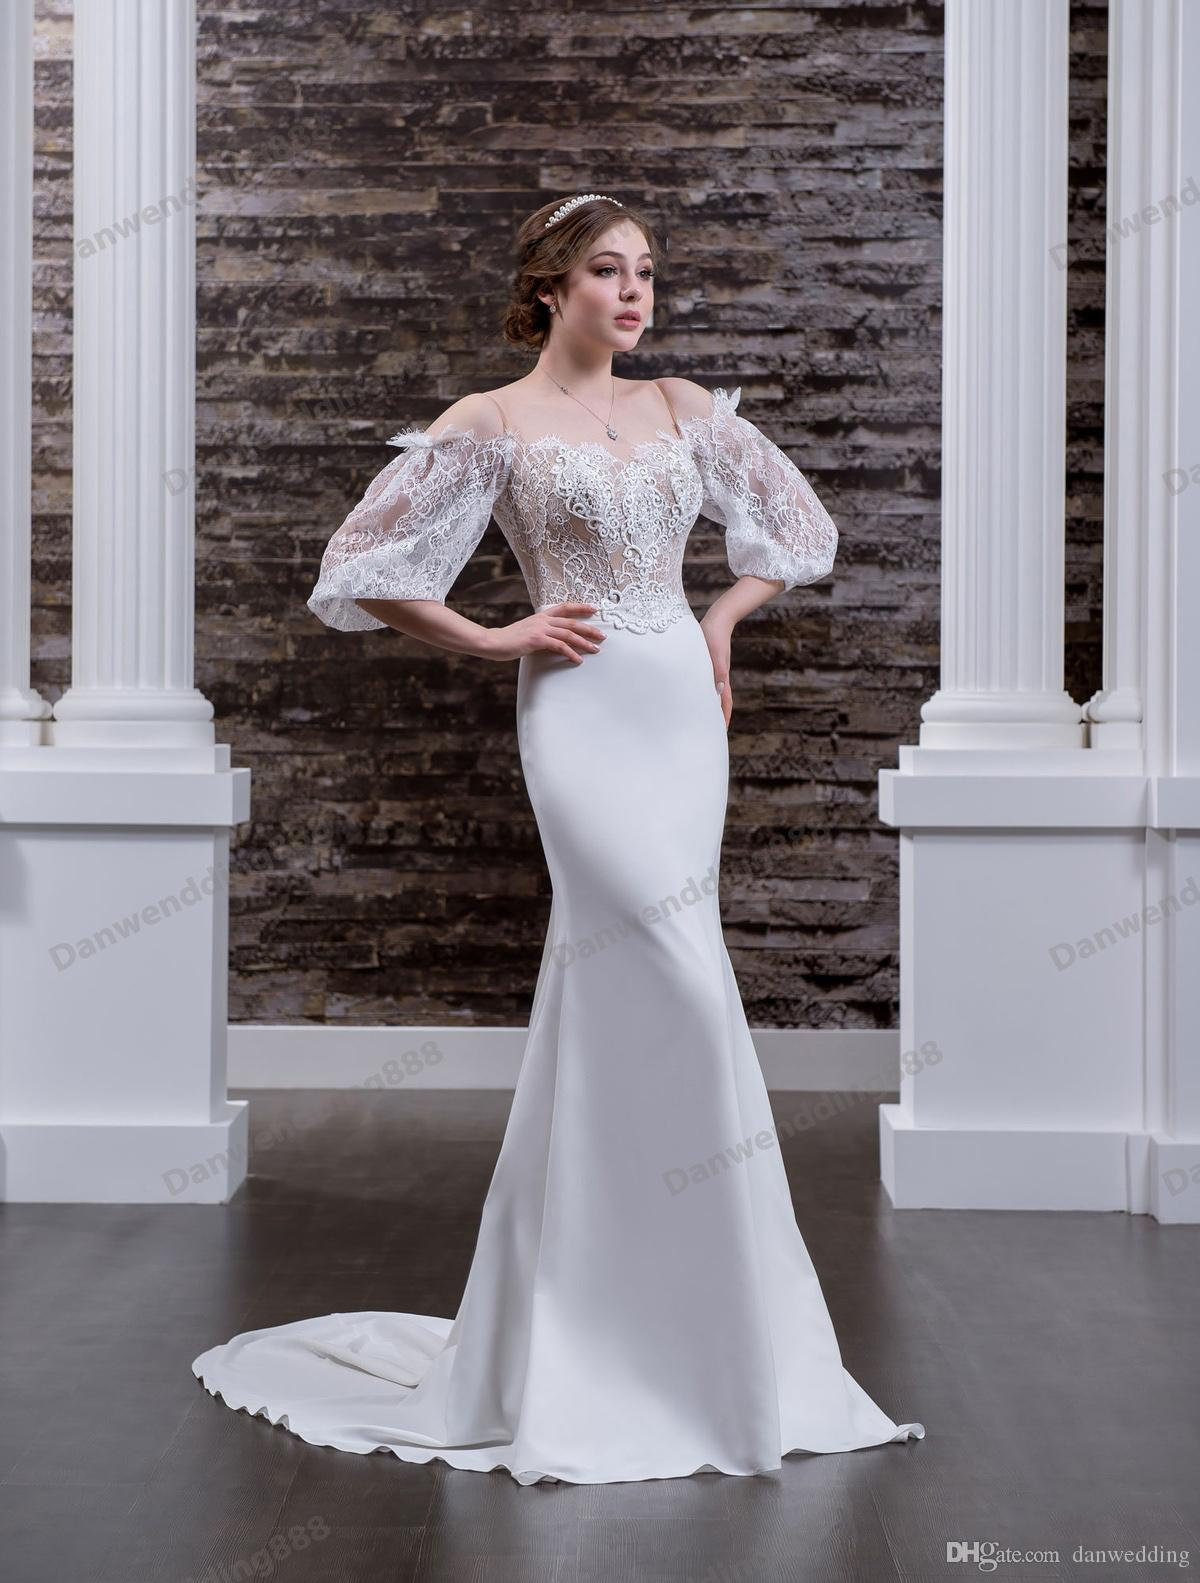 Grace Ivory Satin/Lace Off Shoulder Straps Mermaid Wedding Dresses Bridal Pageant Dresses Wedding Attire Dresses Custom Size 2-16 ZW612182